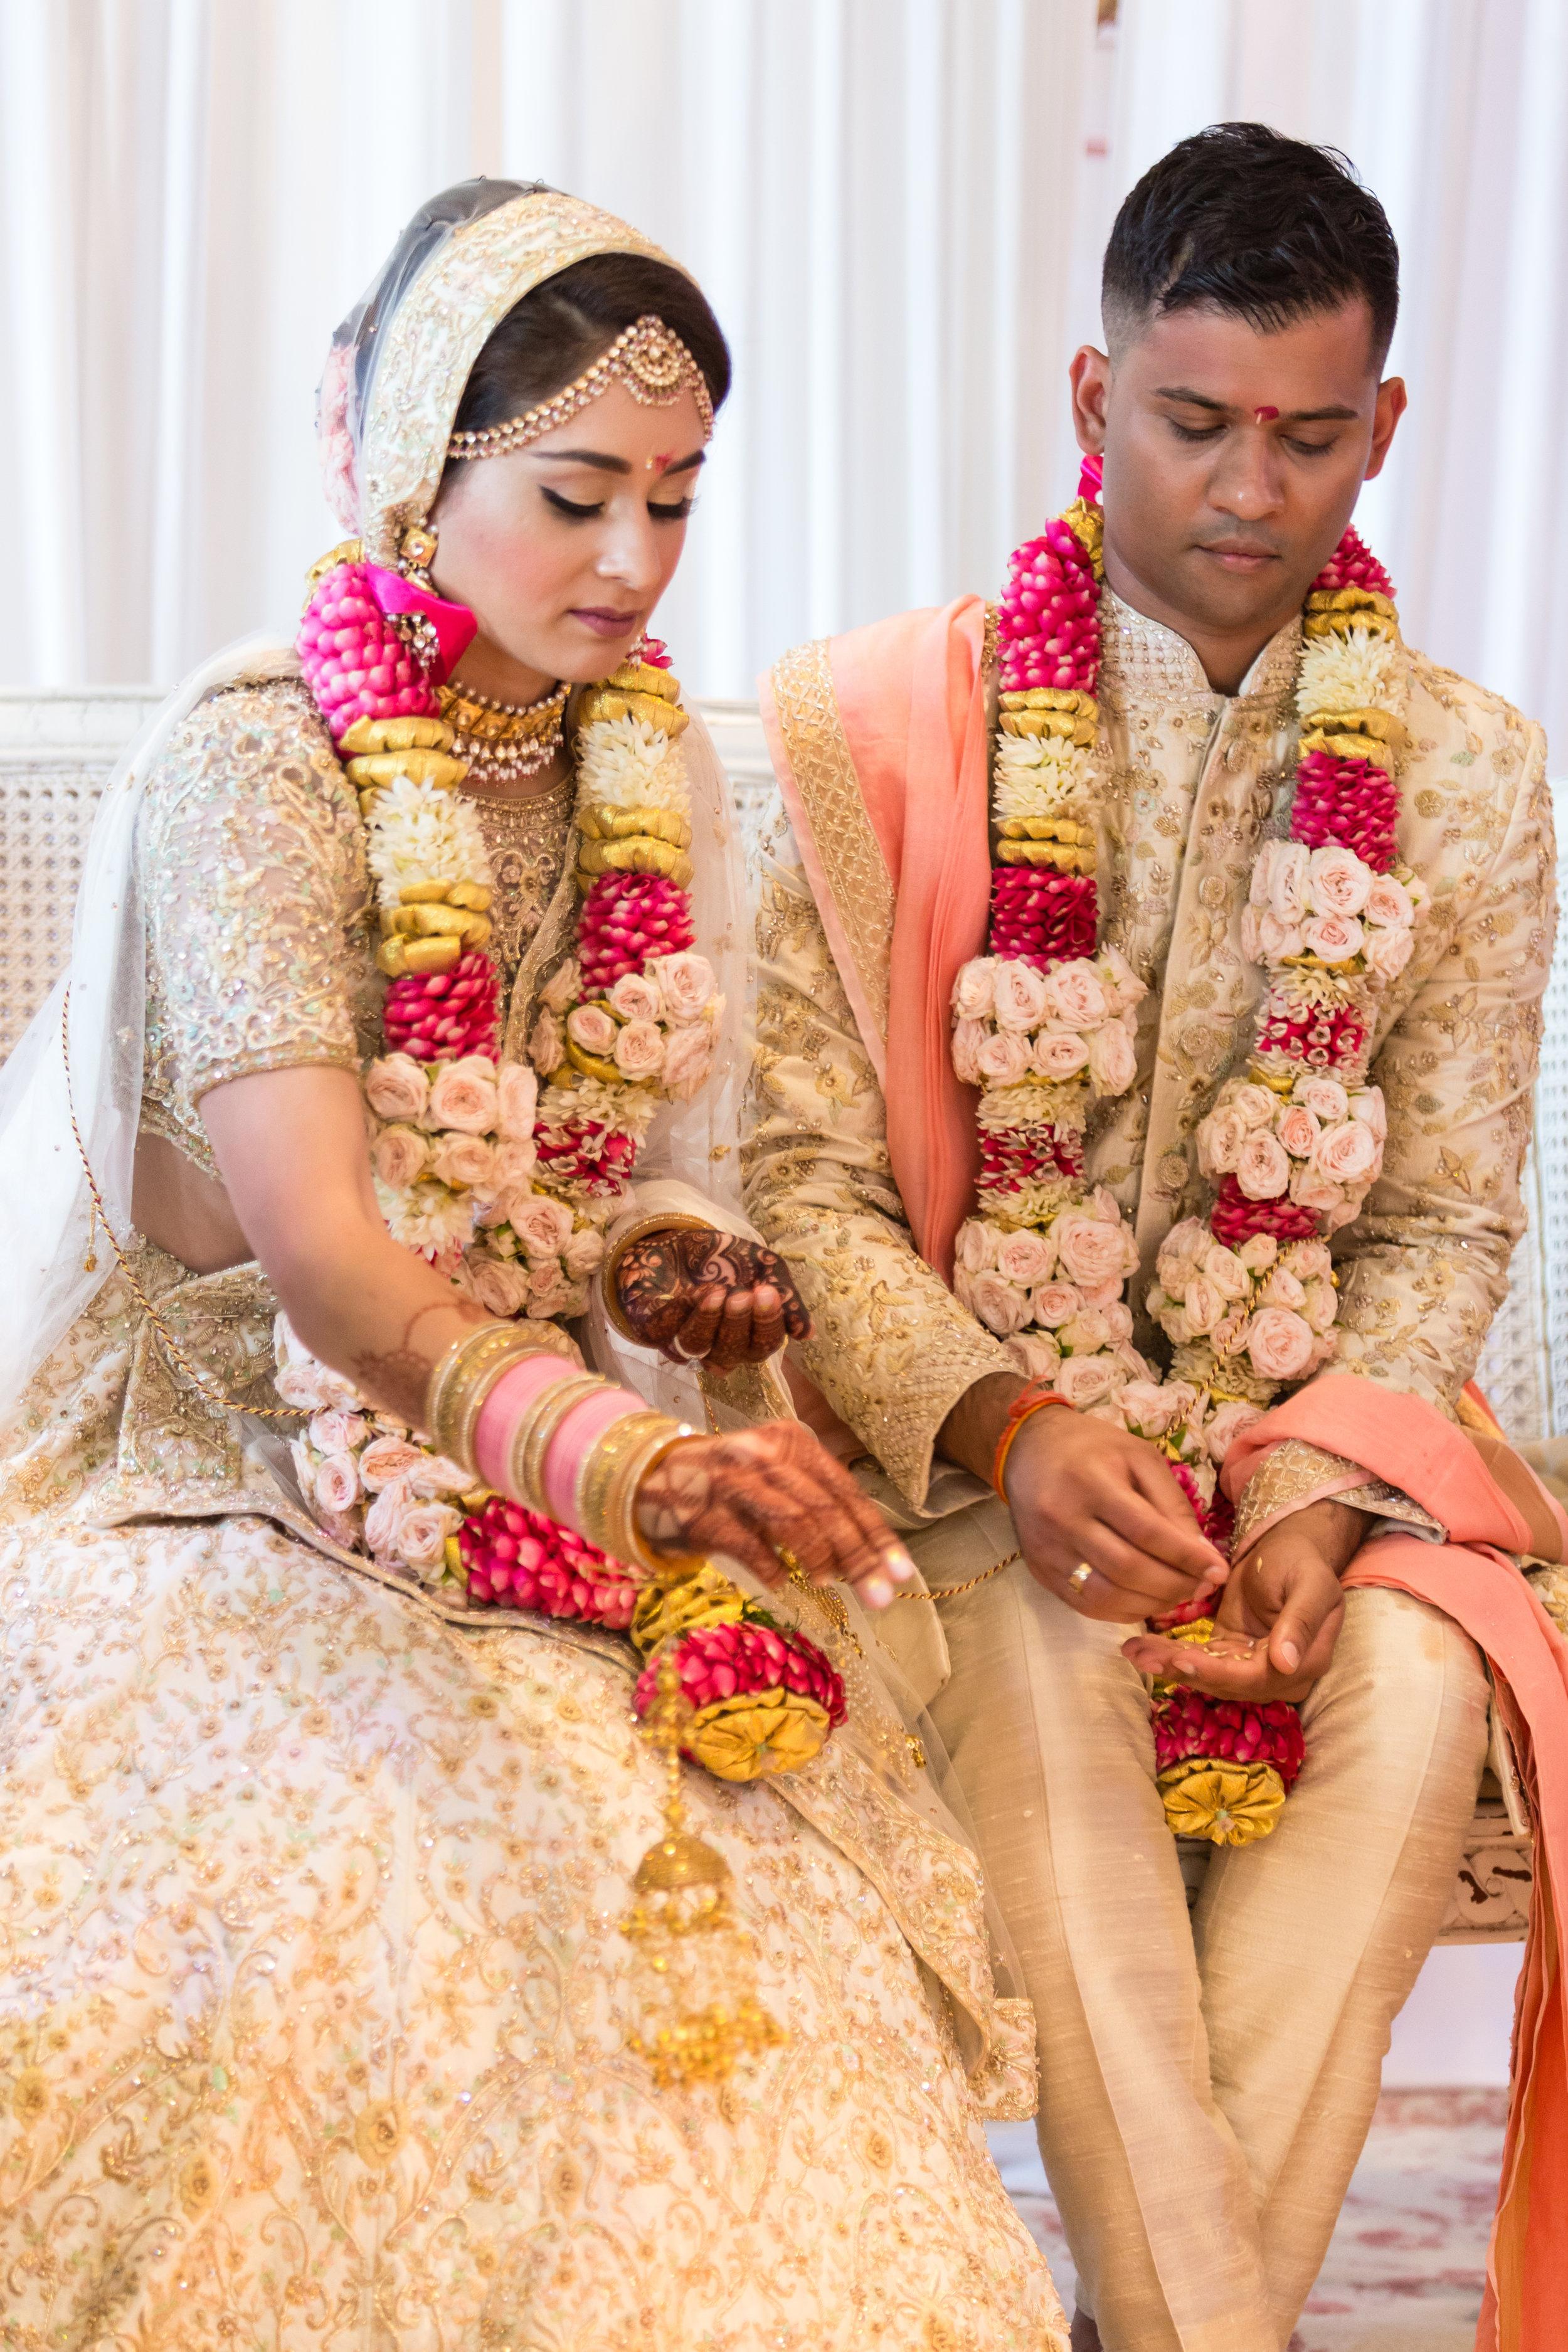 INDIAN WEDDING BRIDE AND GROOM MARRIAGE.jpg